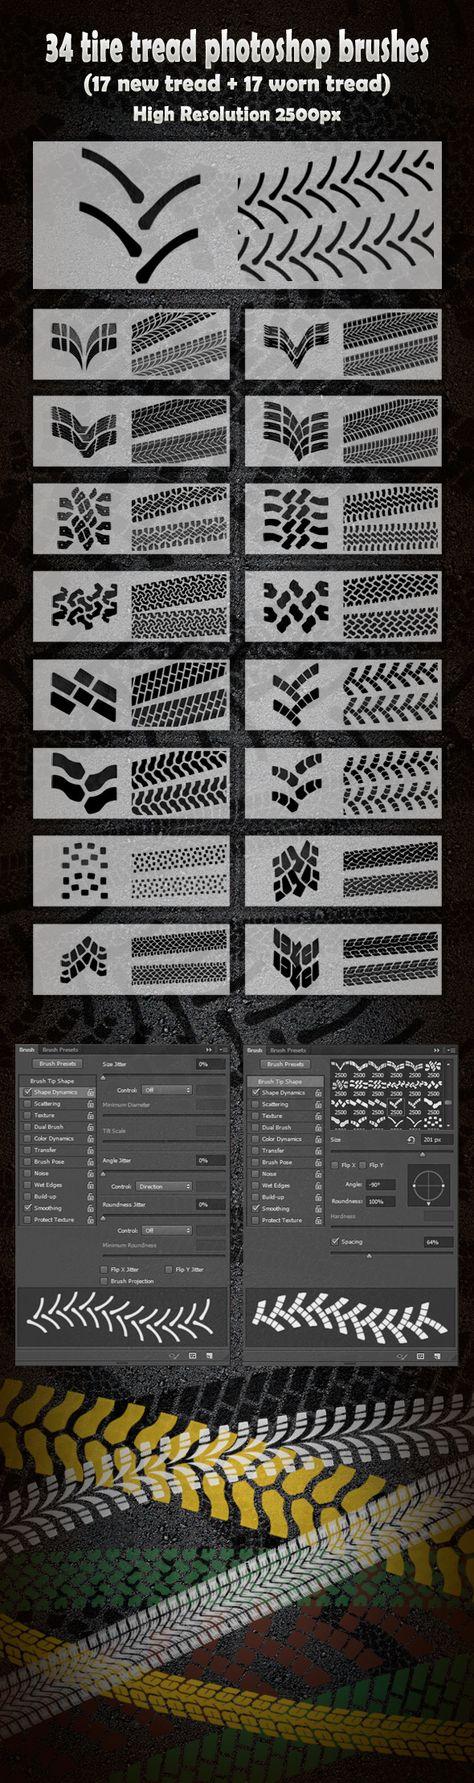 34 Tire Tread Photoshop Brushes